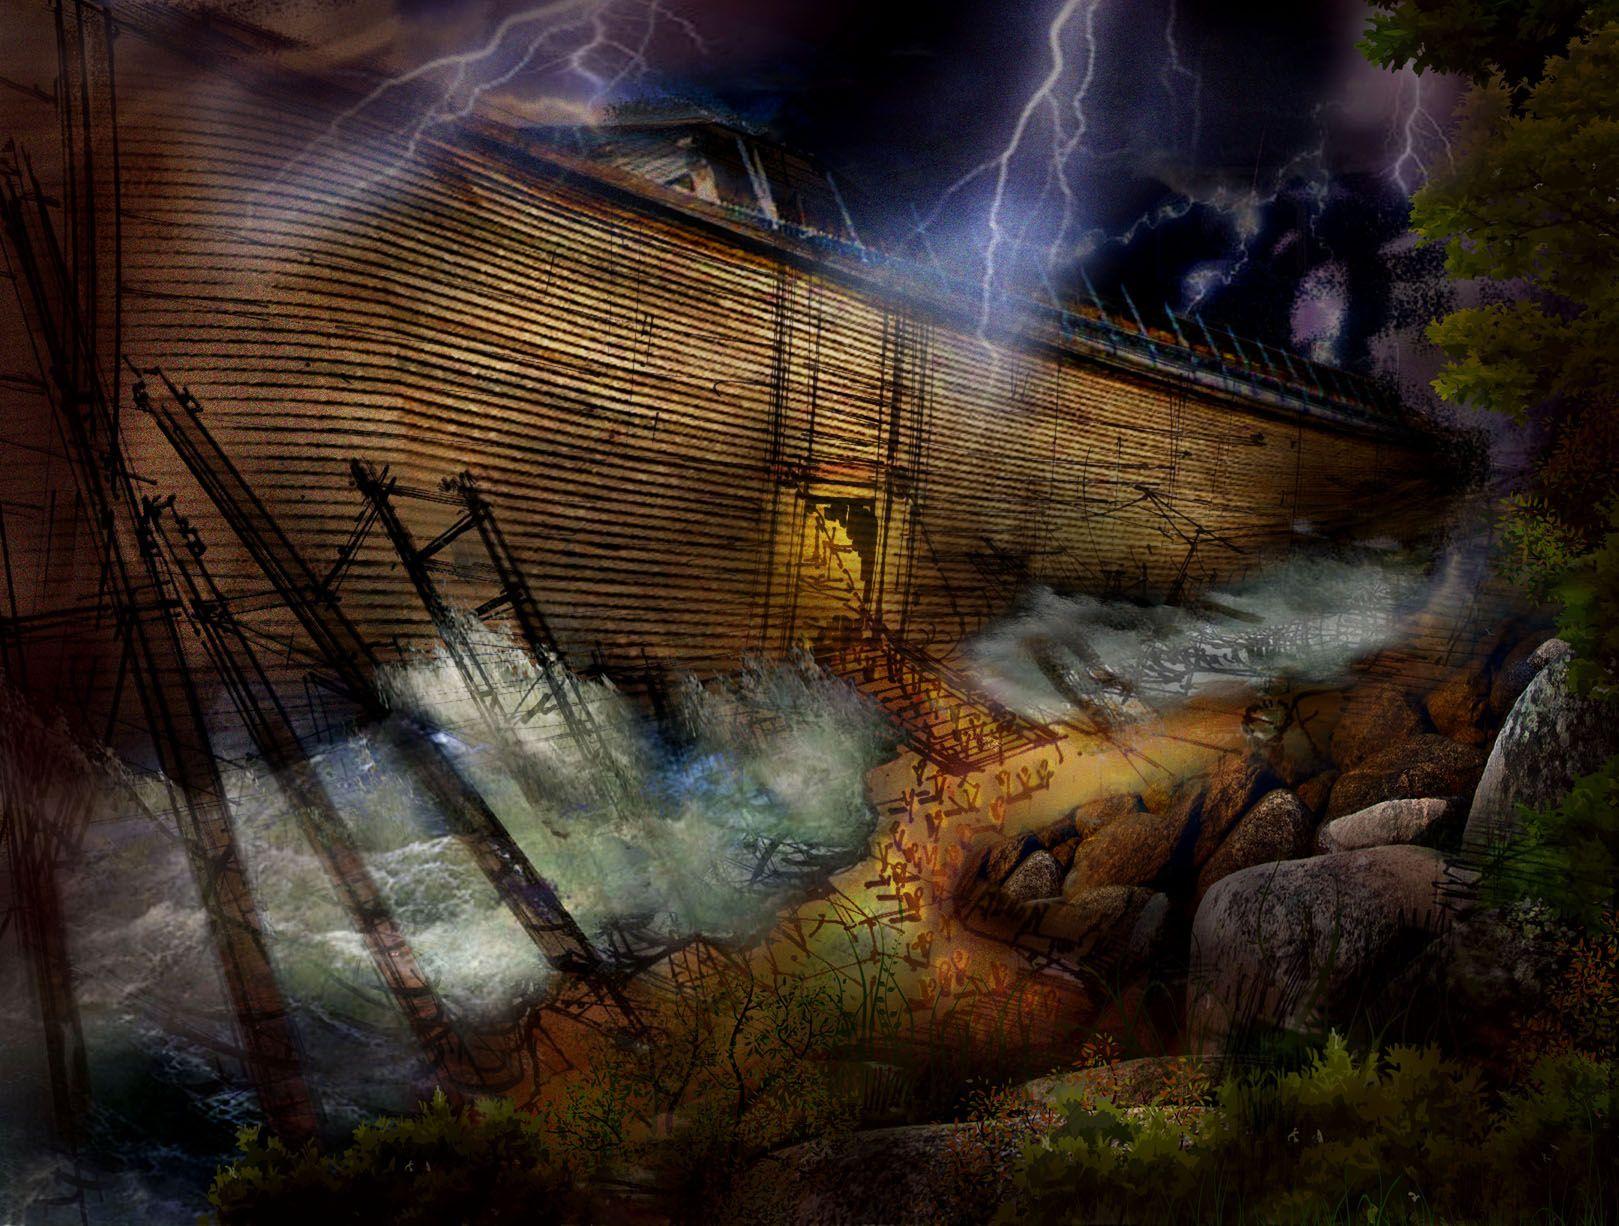 Noah's Ark Experience | Noah's ark bible, Noahs ark, Bible ...